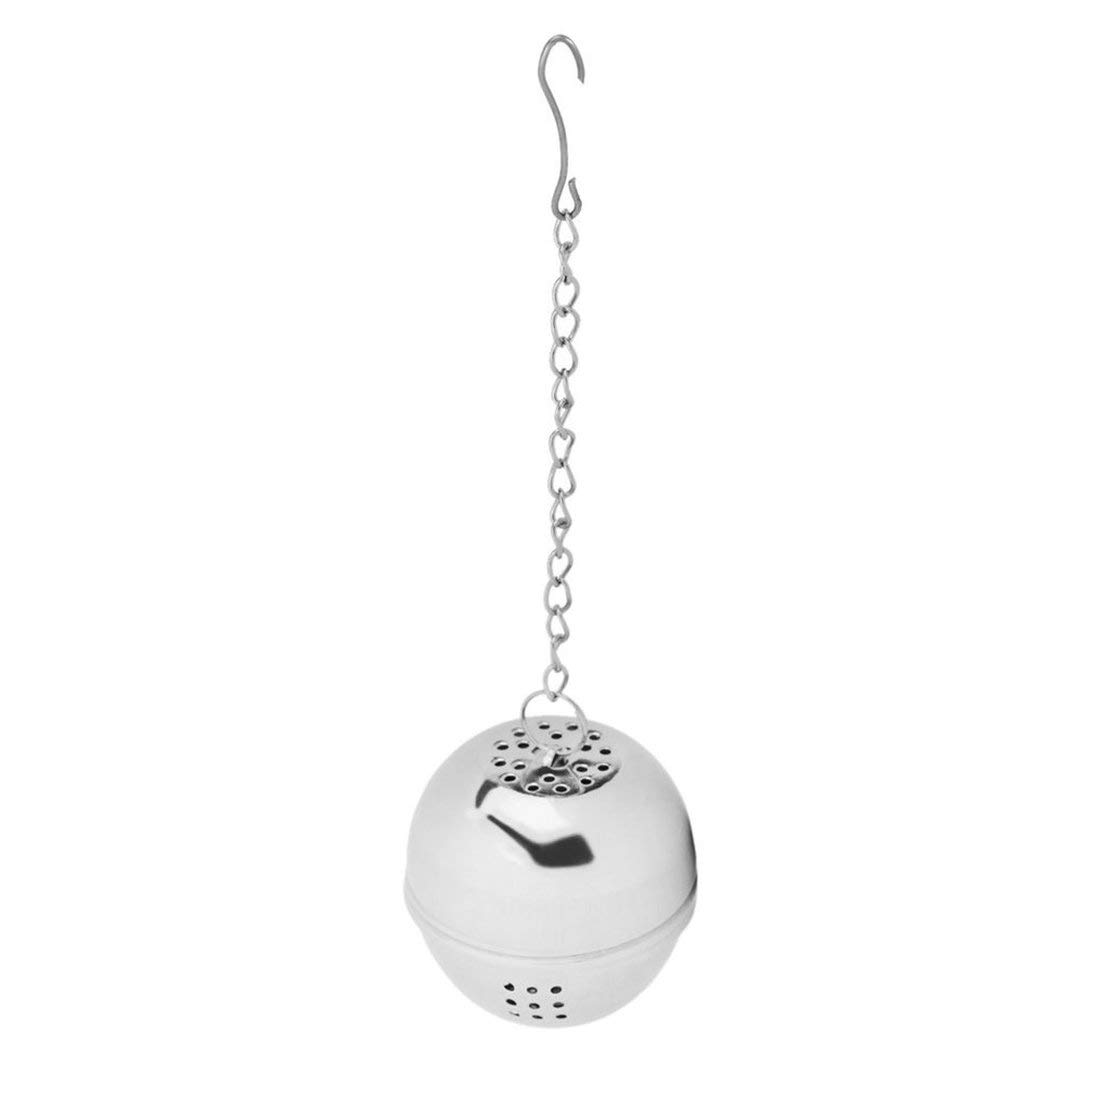 Baynne 1pcs Stainless Steel Seasoning Ball teakettles Strainer Tea Filter Locking FreeShipping